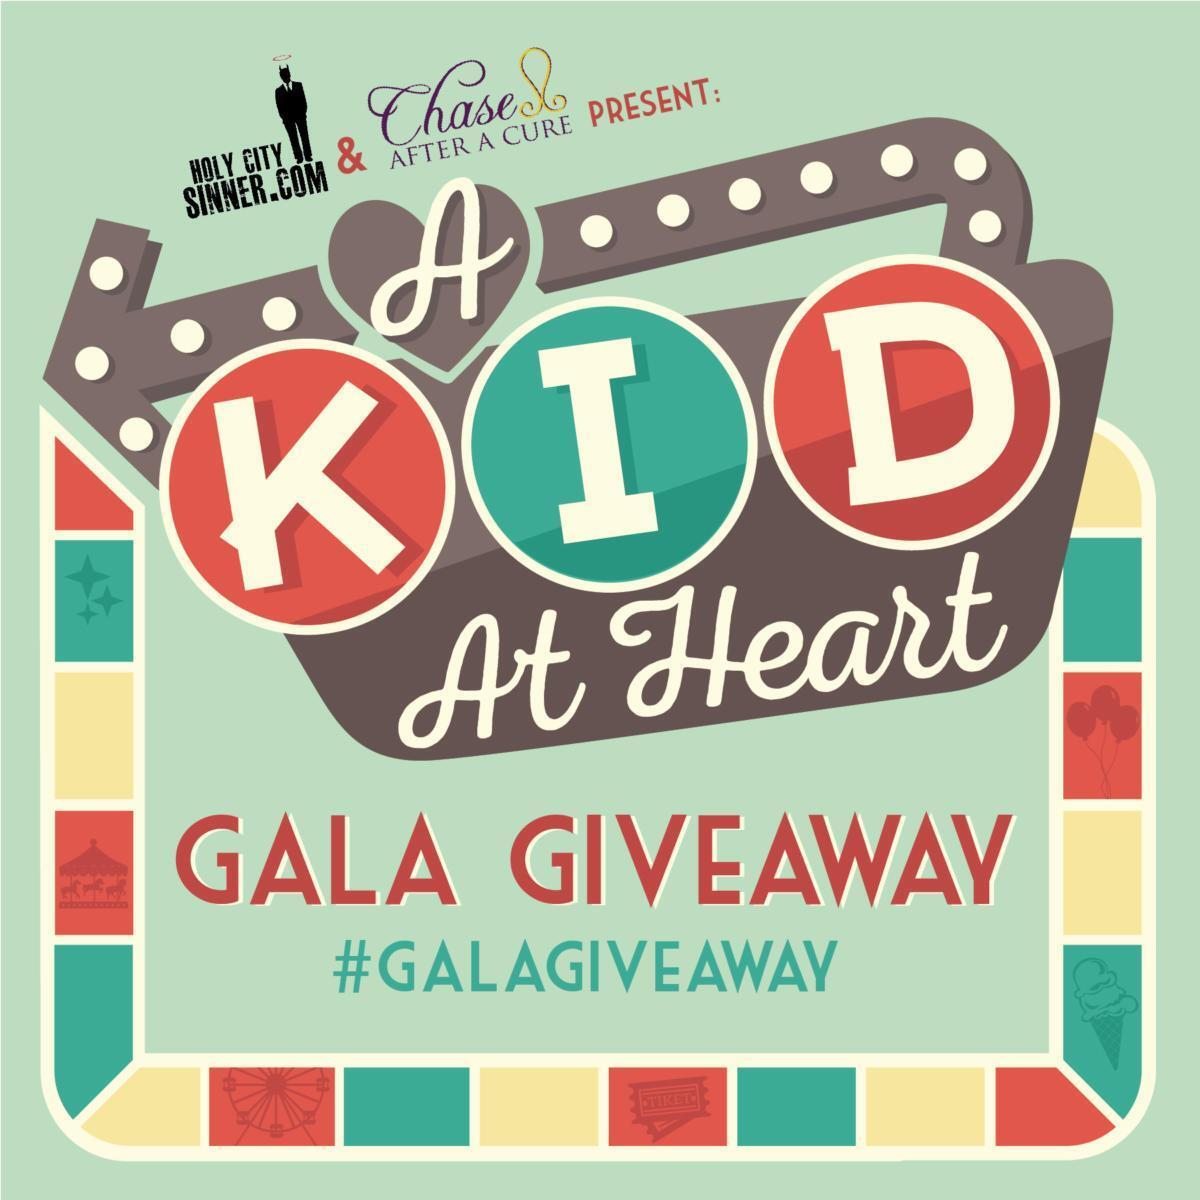 caac_gala-giveaway_square-021